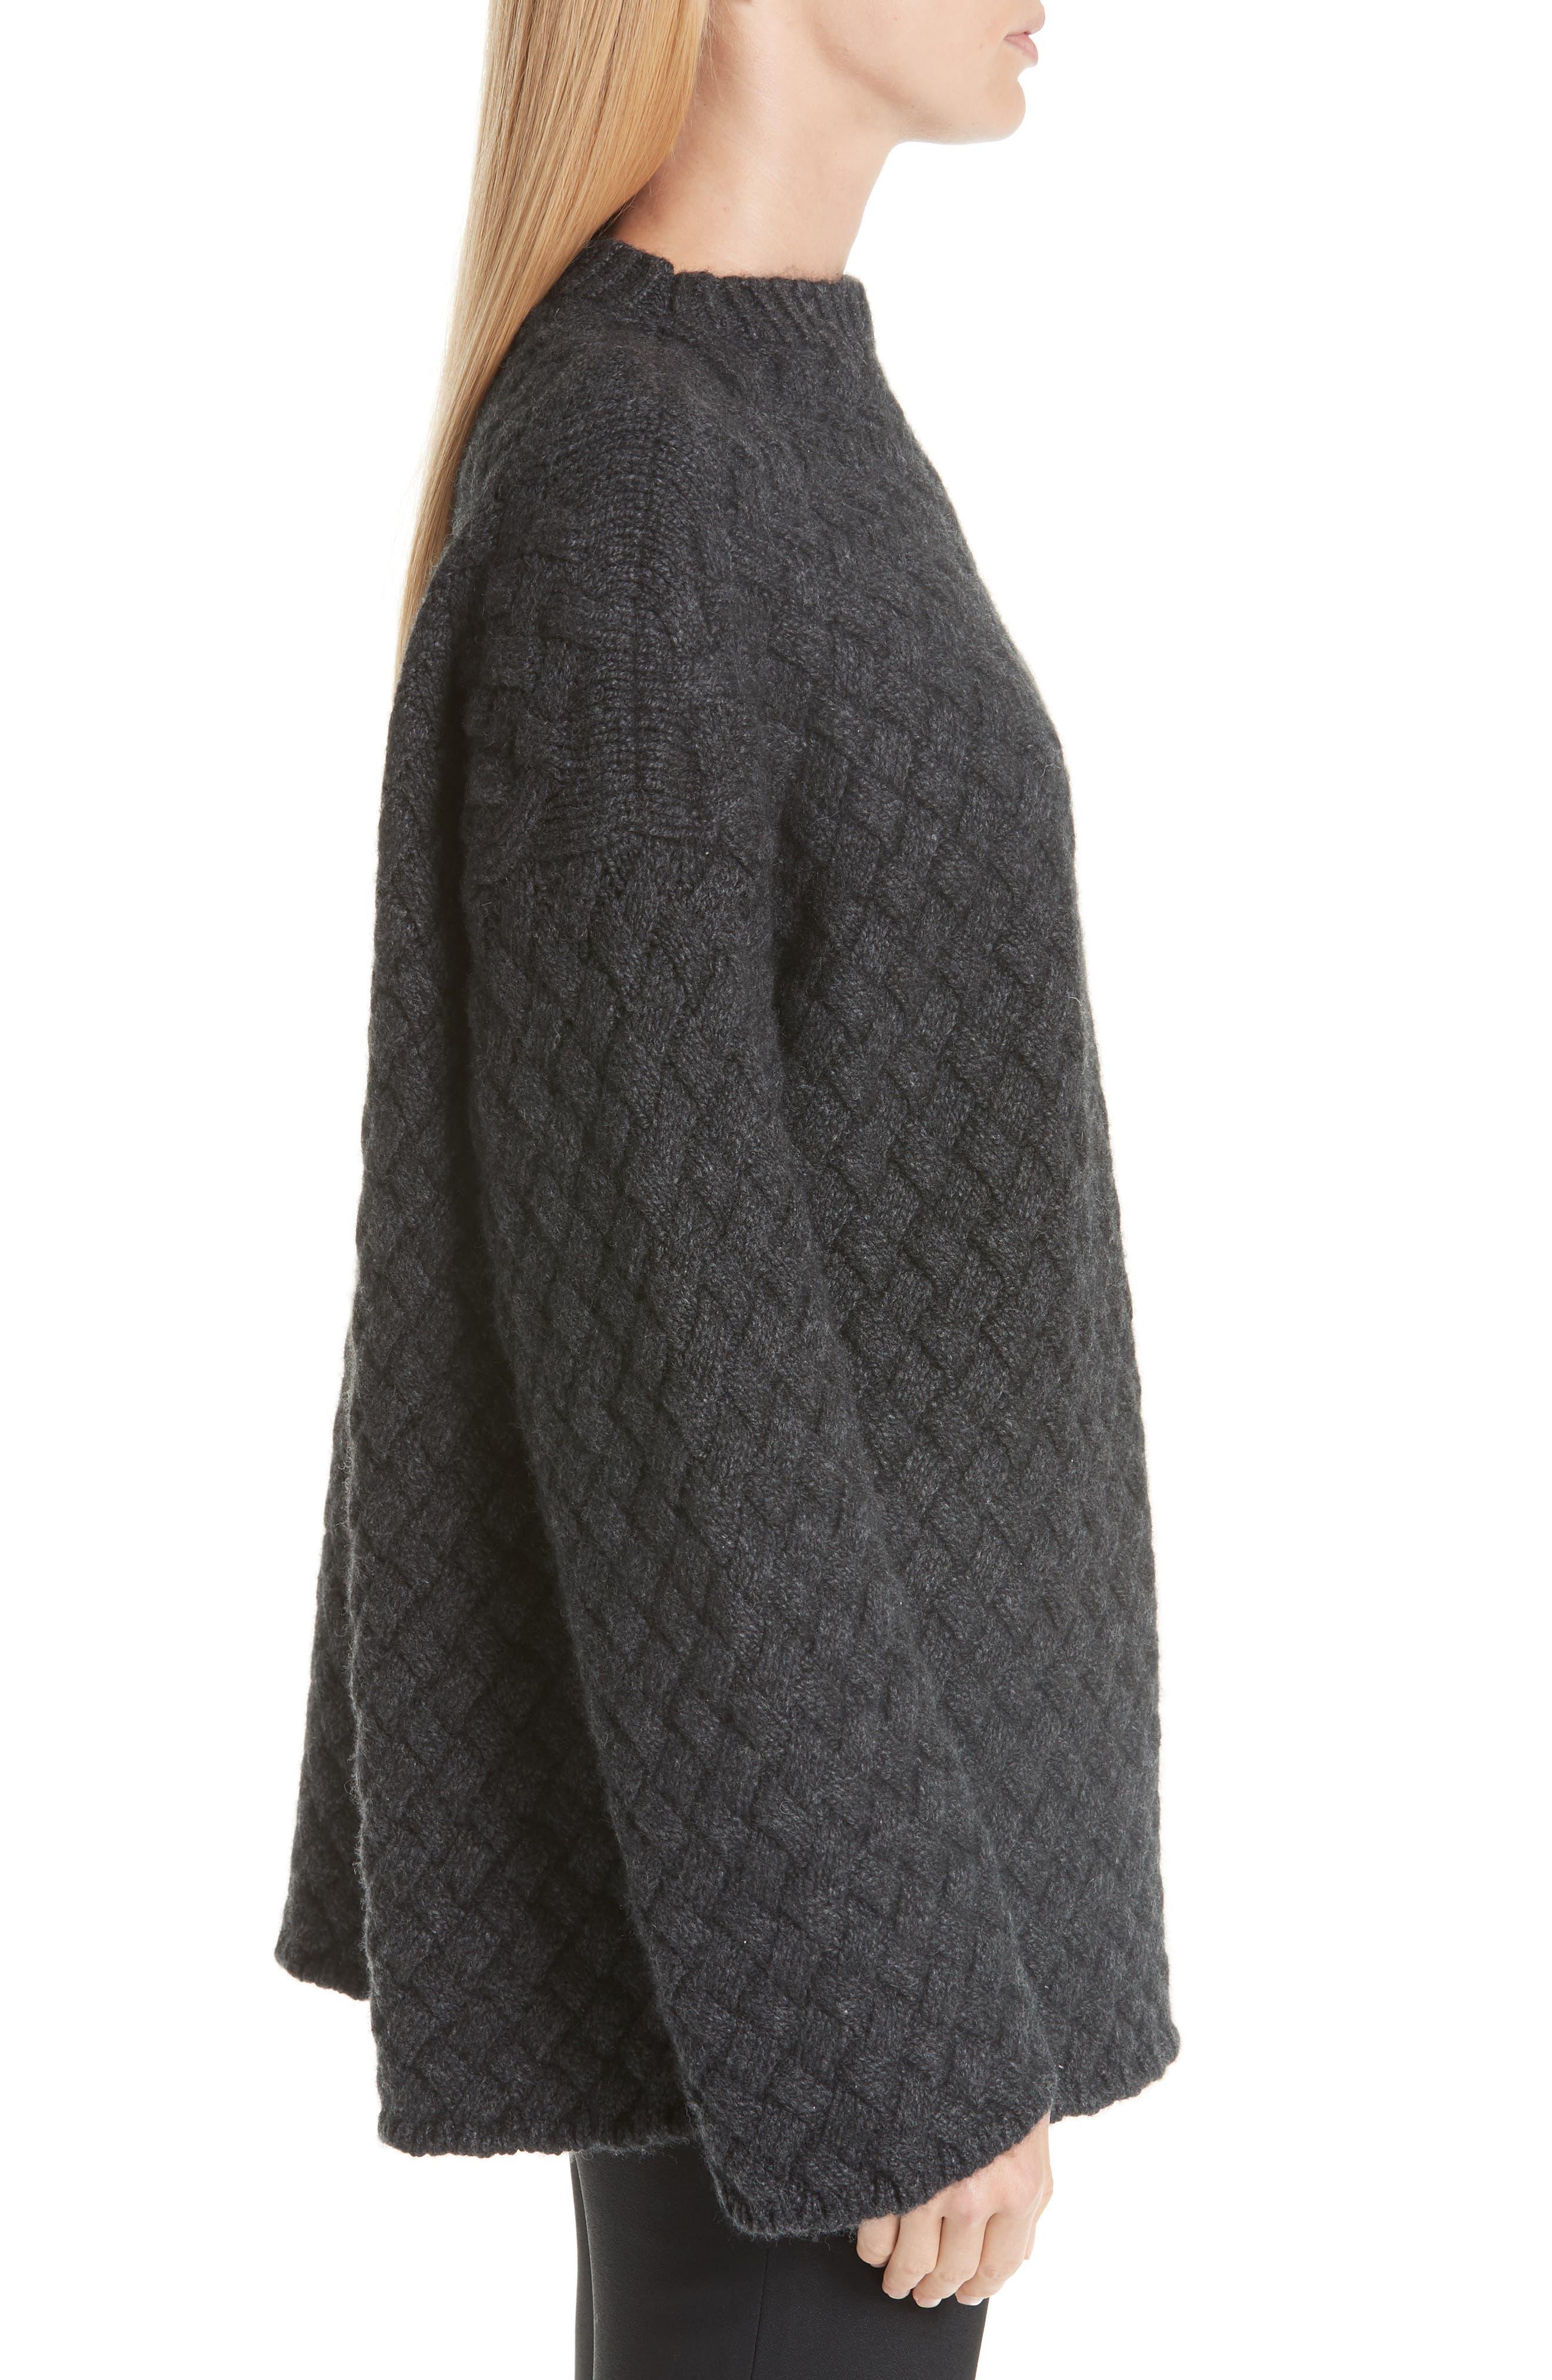 Oversized Braided Cashmere Sweater,                             Alternate thumbnail 3, color,                             DARK GREY